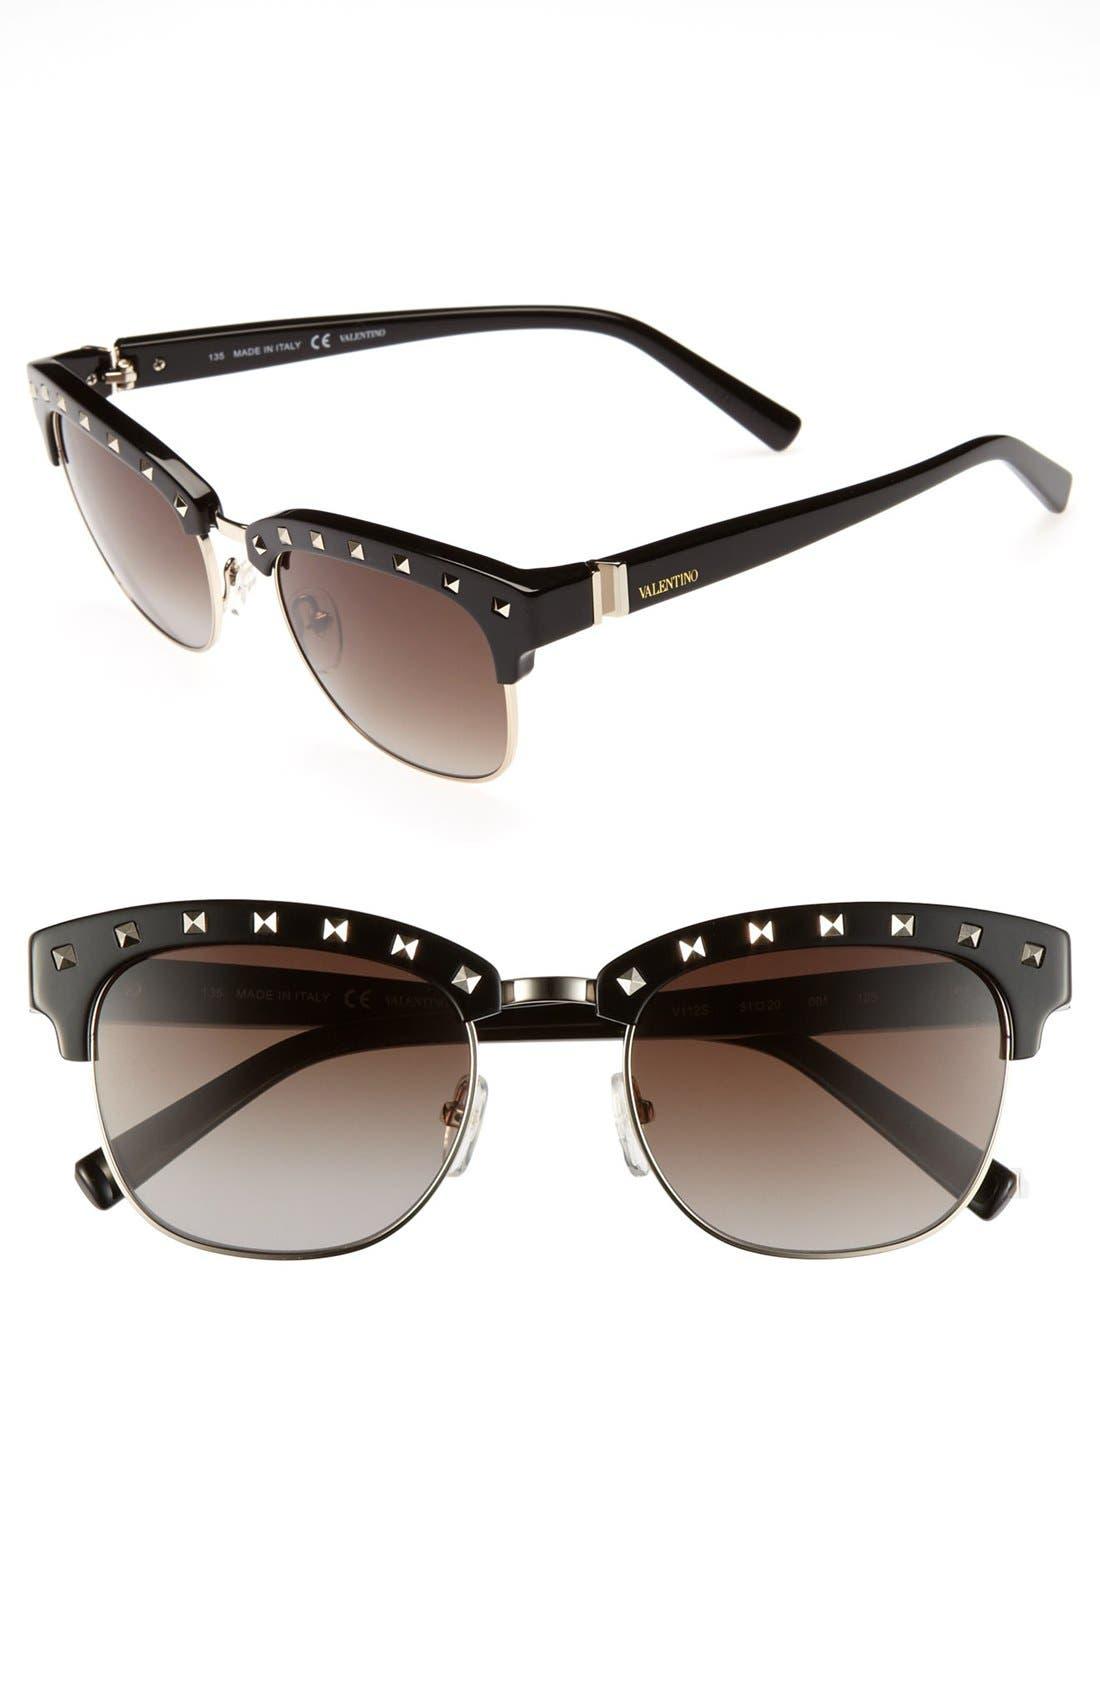 Main Image - Valentino 'Rockstud' Sunglasses (Online Only)